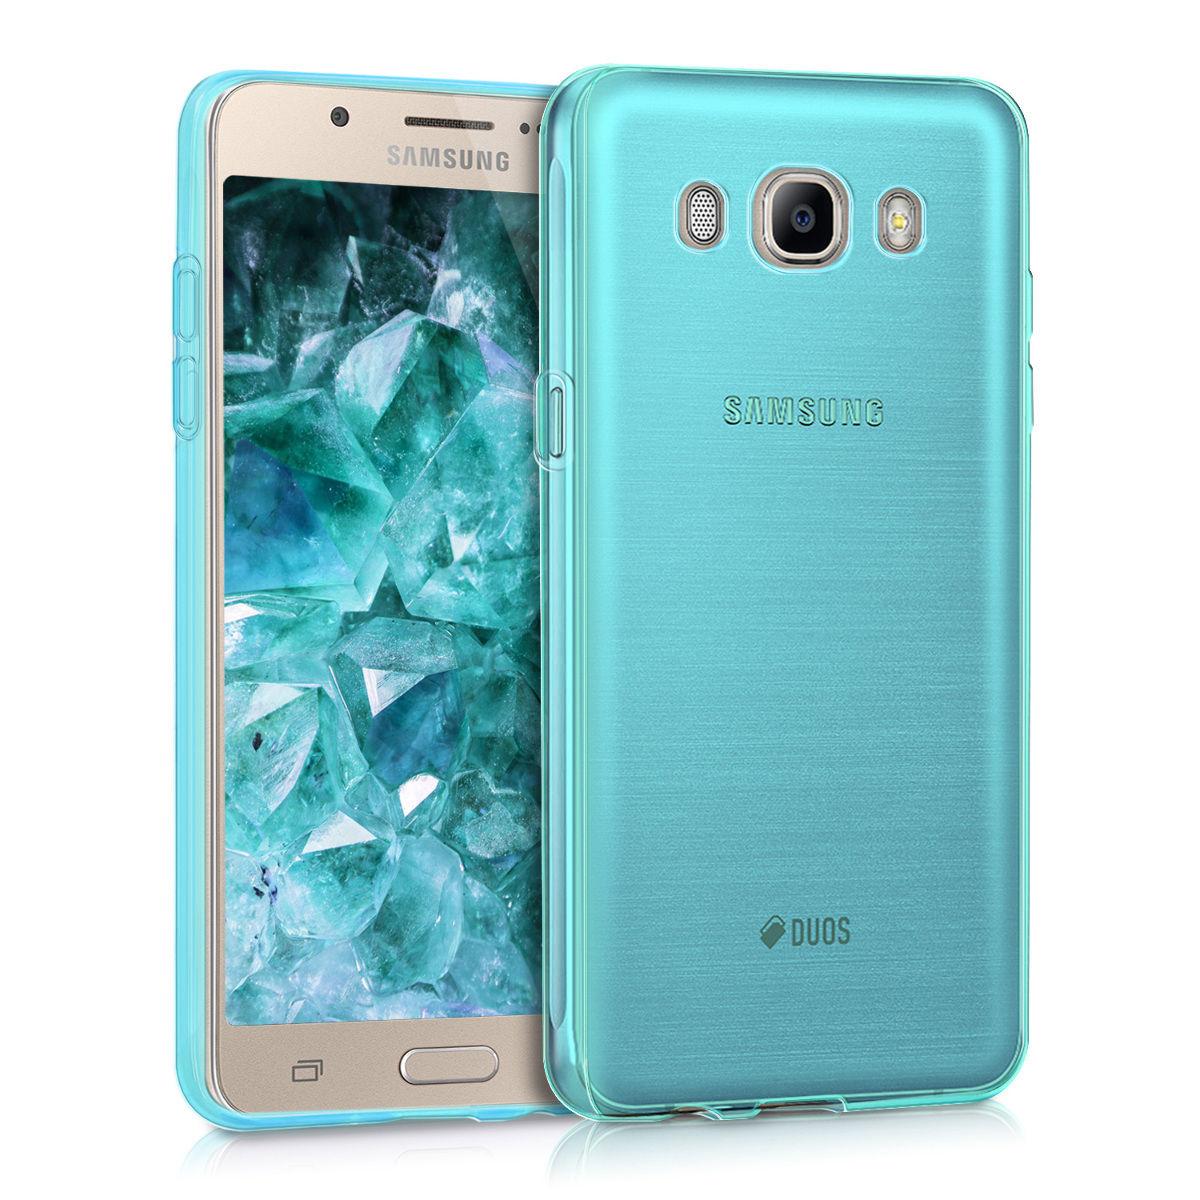 Pouzdro GEL pro Samsung Galaxy J5 (2016) modré